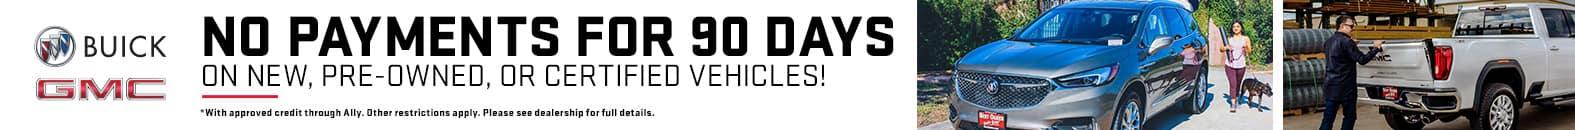 No Payments For 90 Days At Bert Ogden Buick GMC | Edinburg, TX